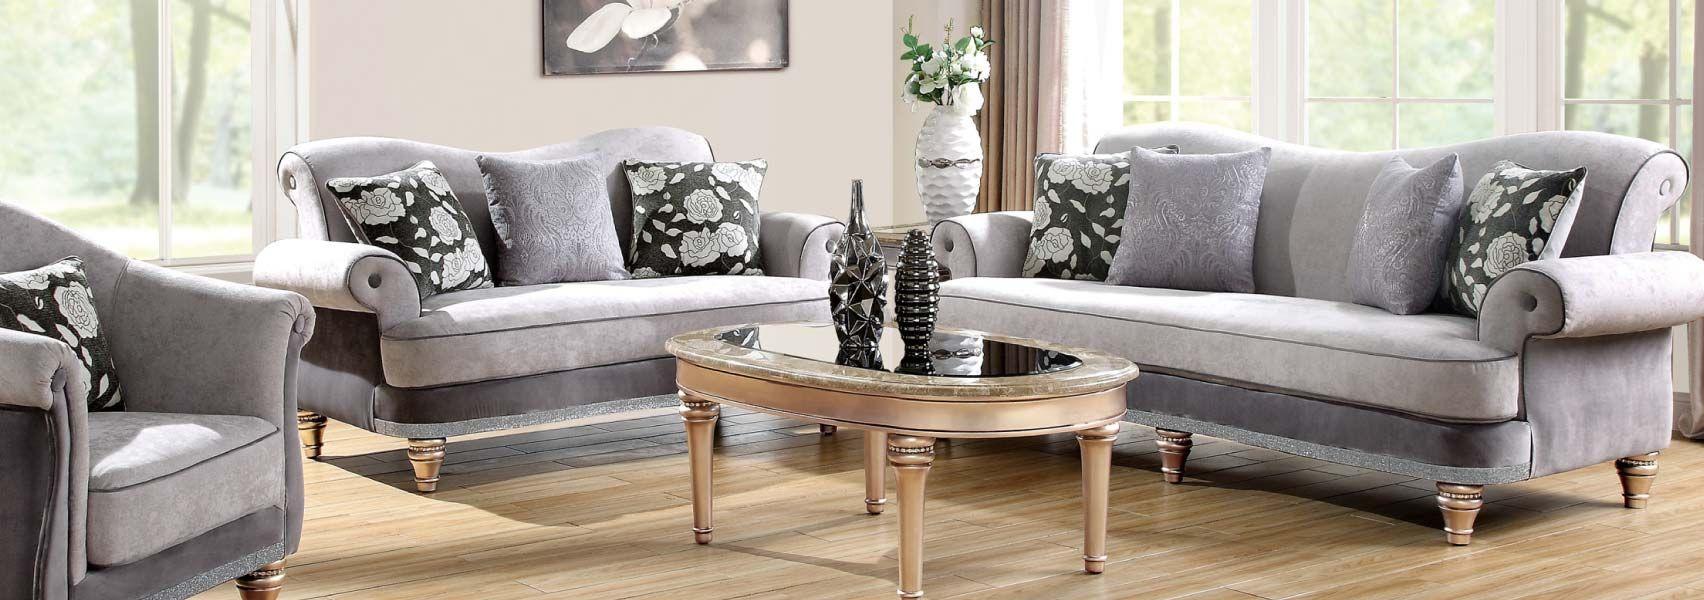 epic sale on living room furniture gardner white in 20